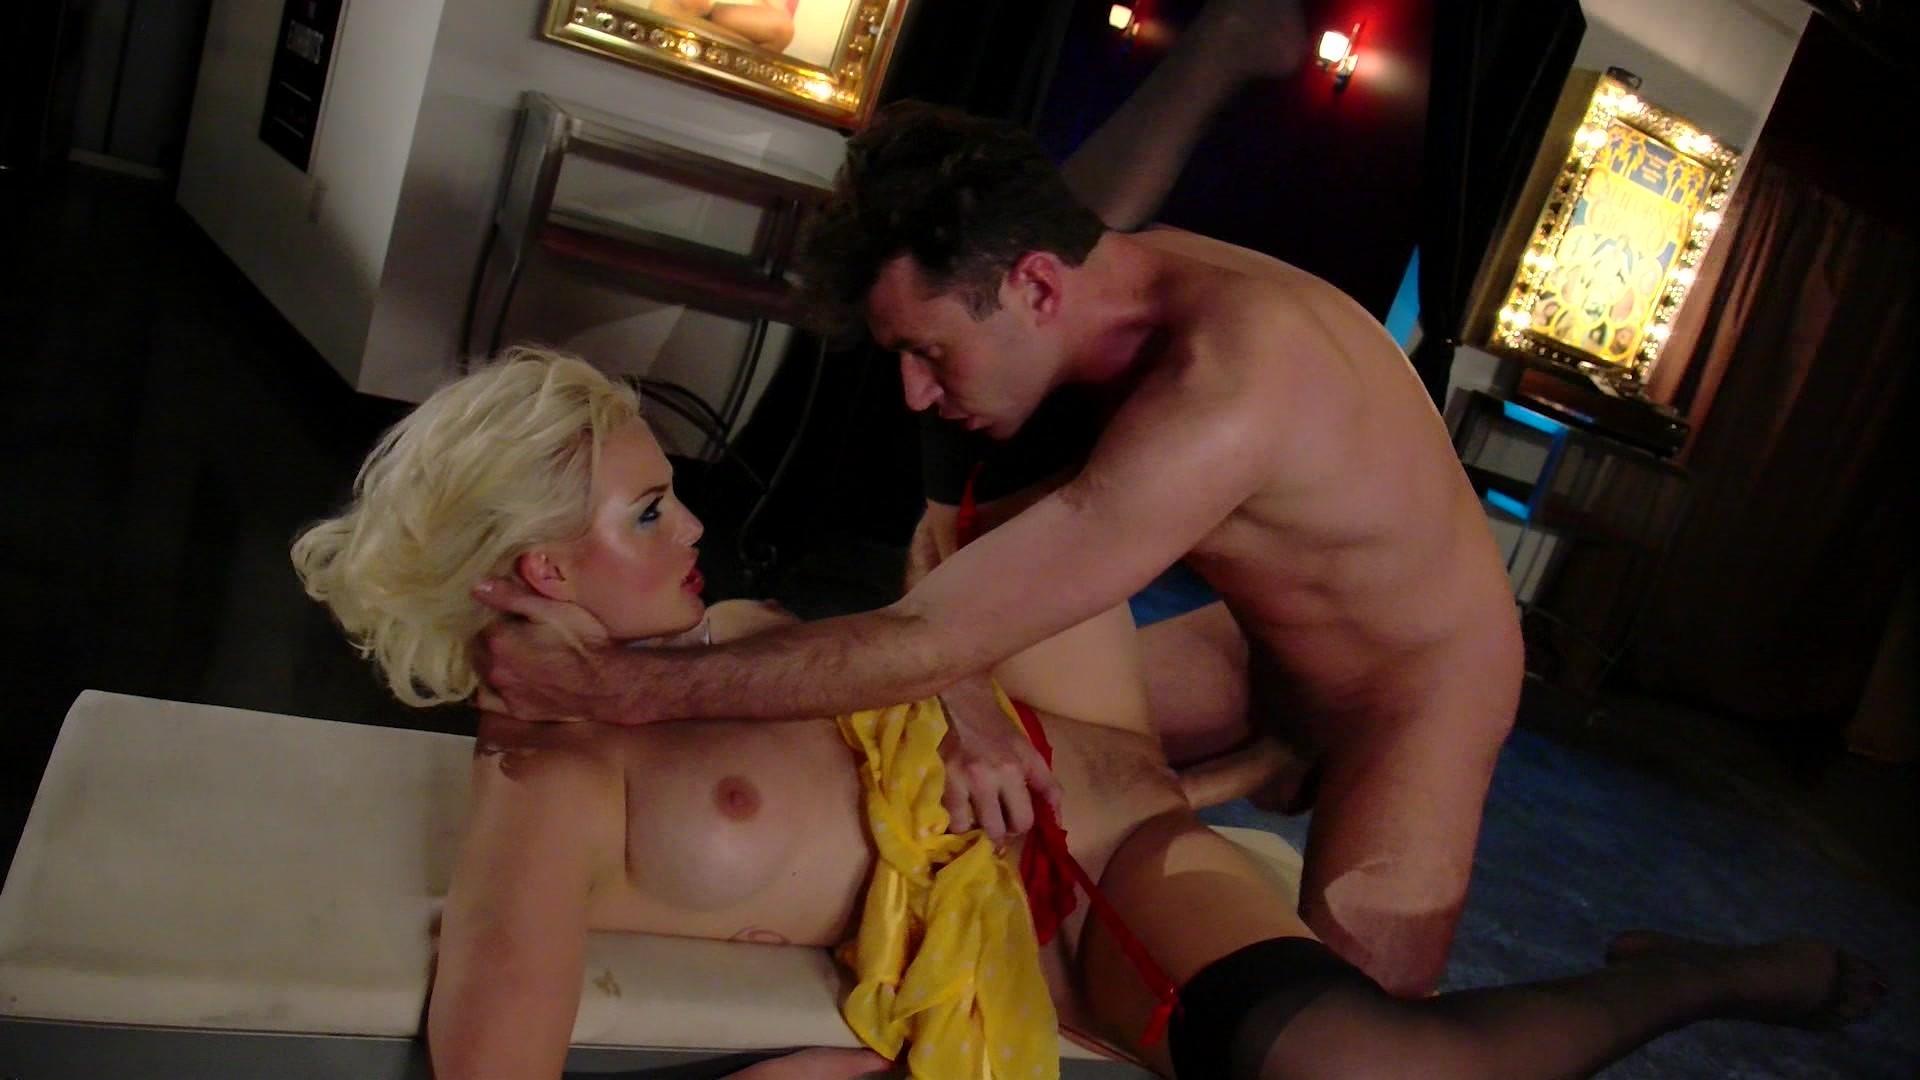 Hot Blonde Jenna Ivory Plays Legendary Beauty Seka Who Gets Fucked by Night Secu... Starring: James Deen Jenna Ivory